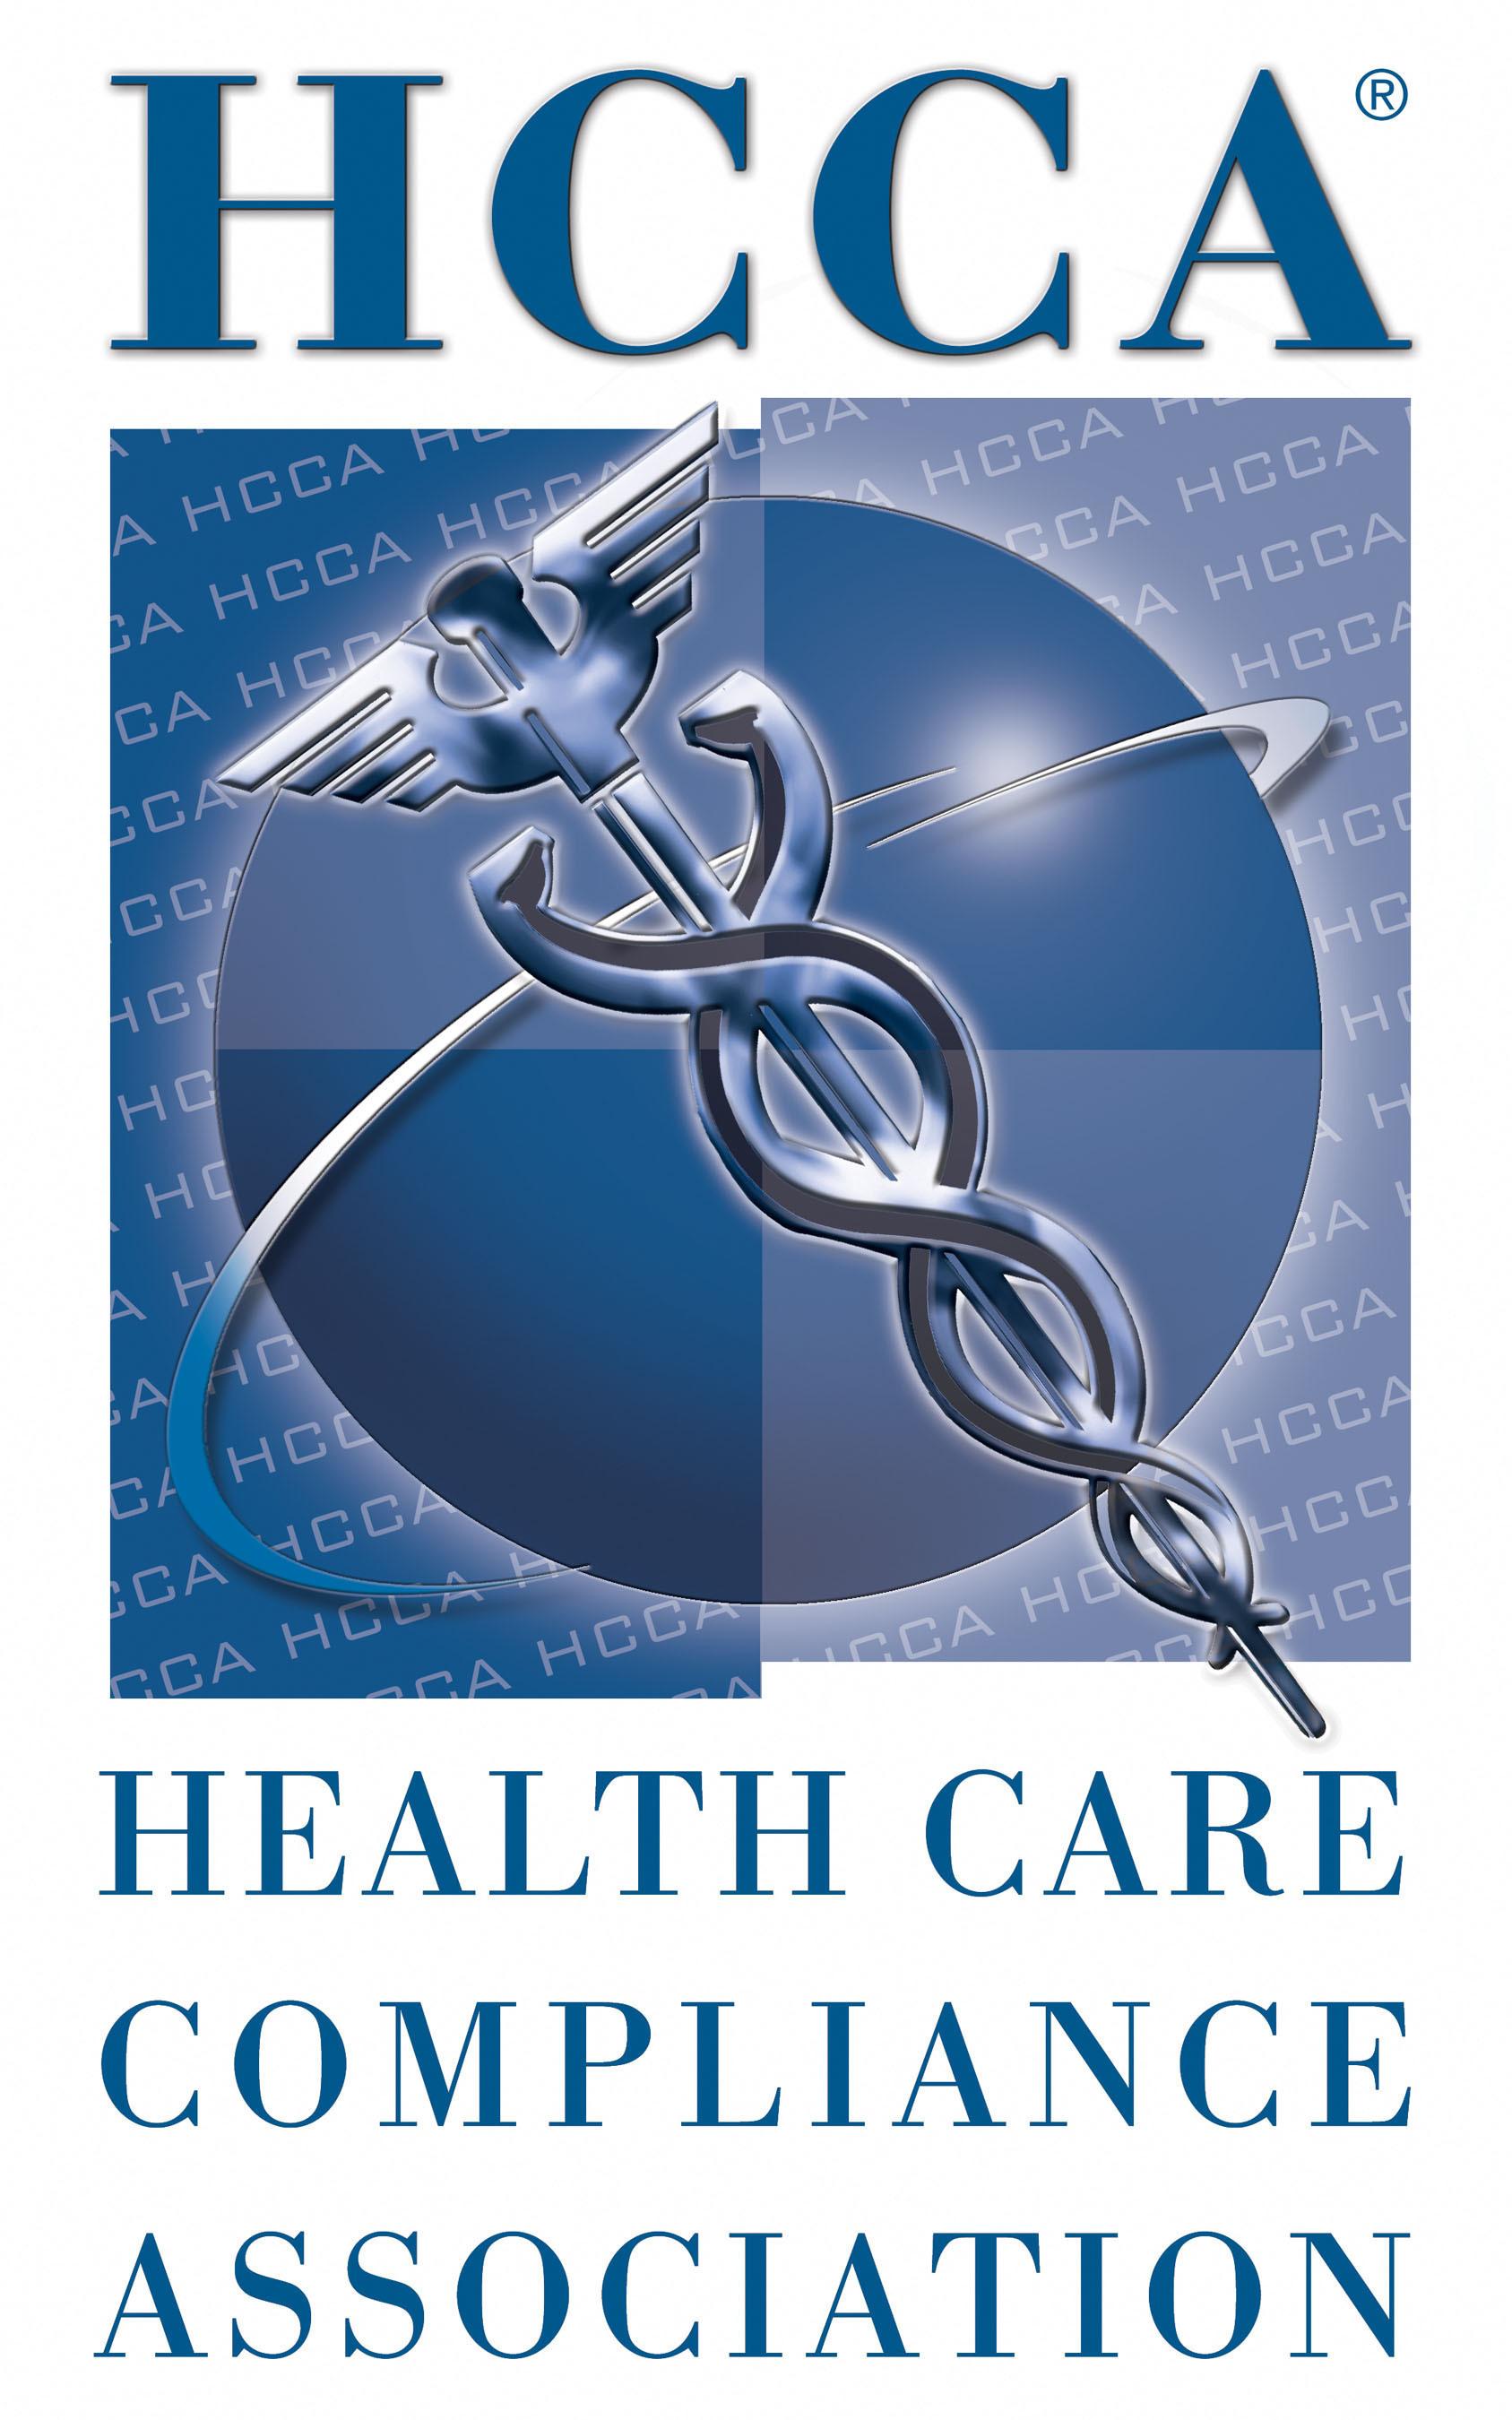 Health Care Compliance Association logo.